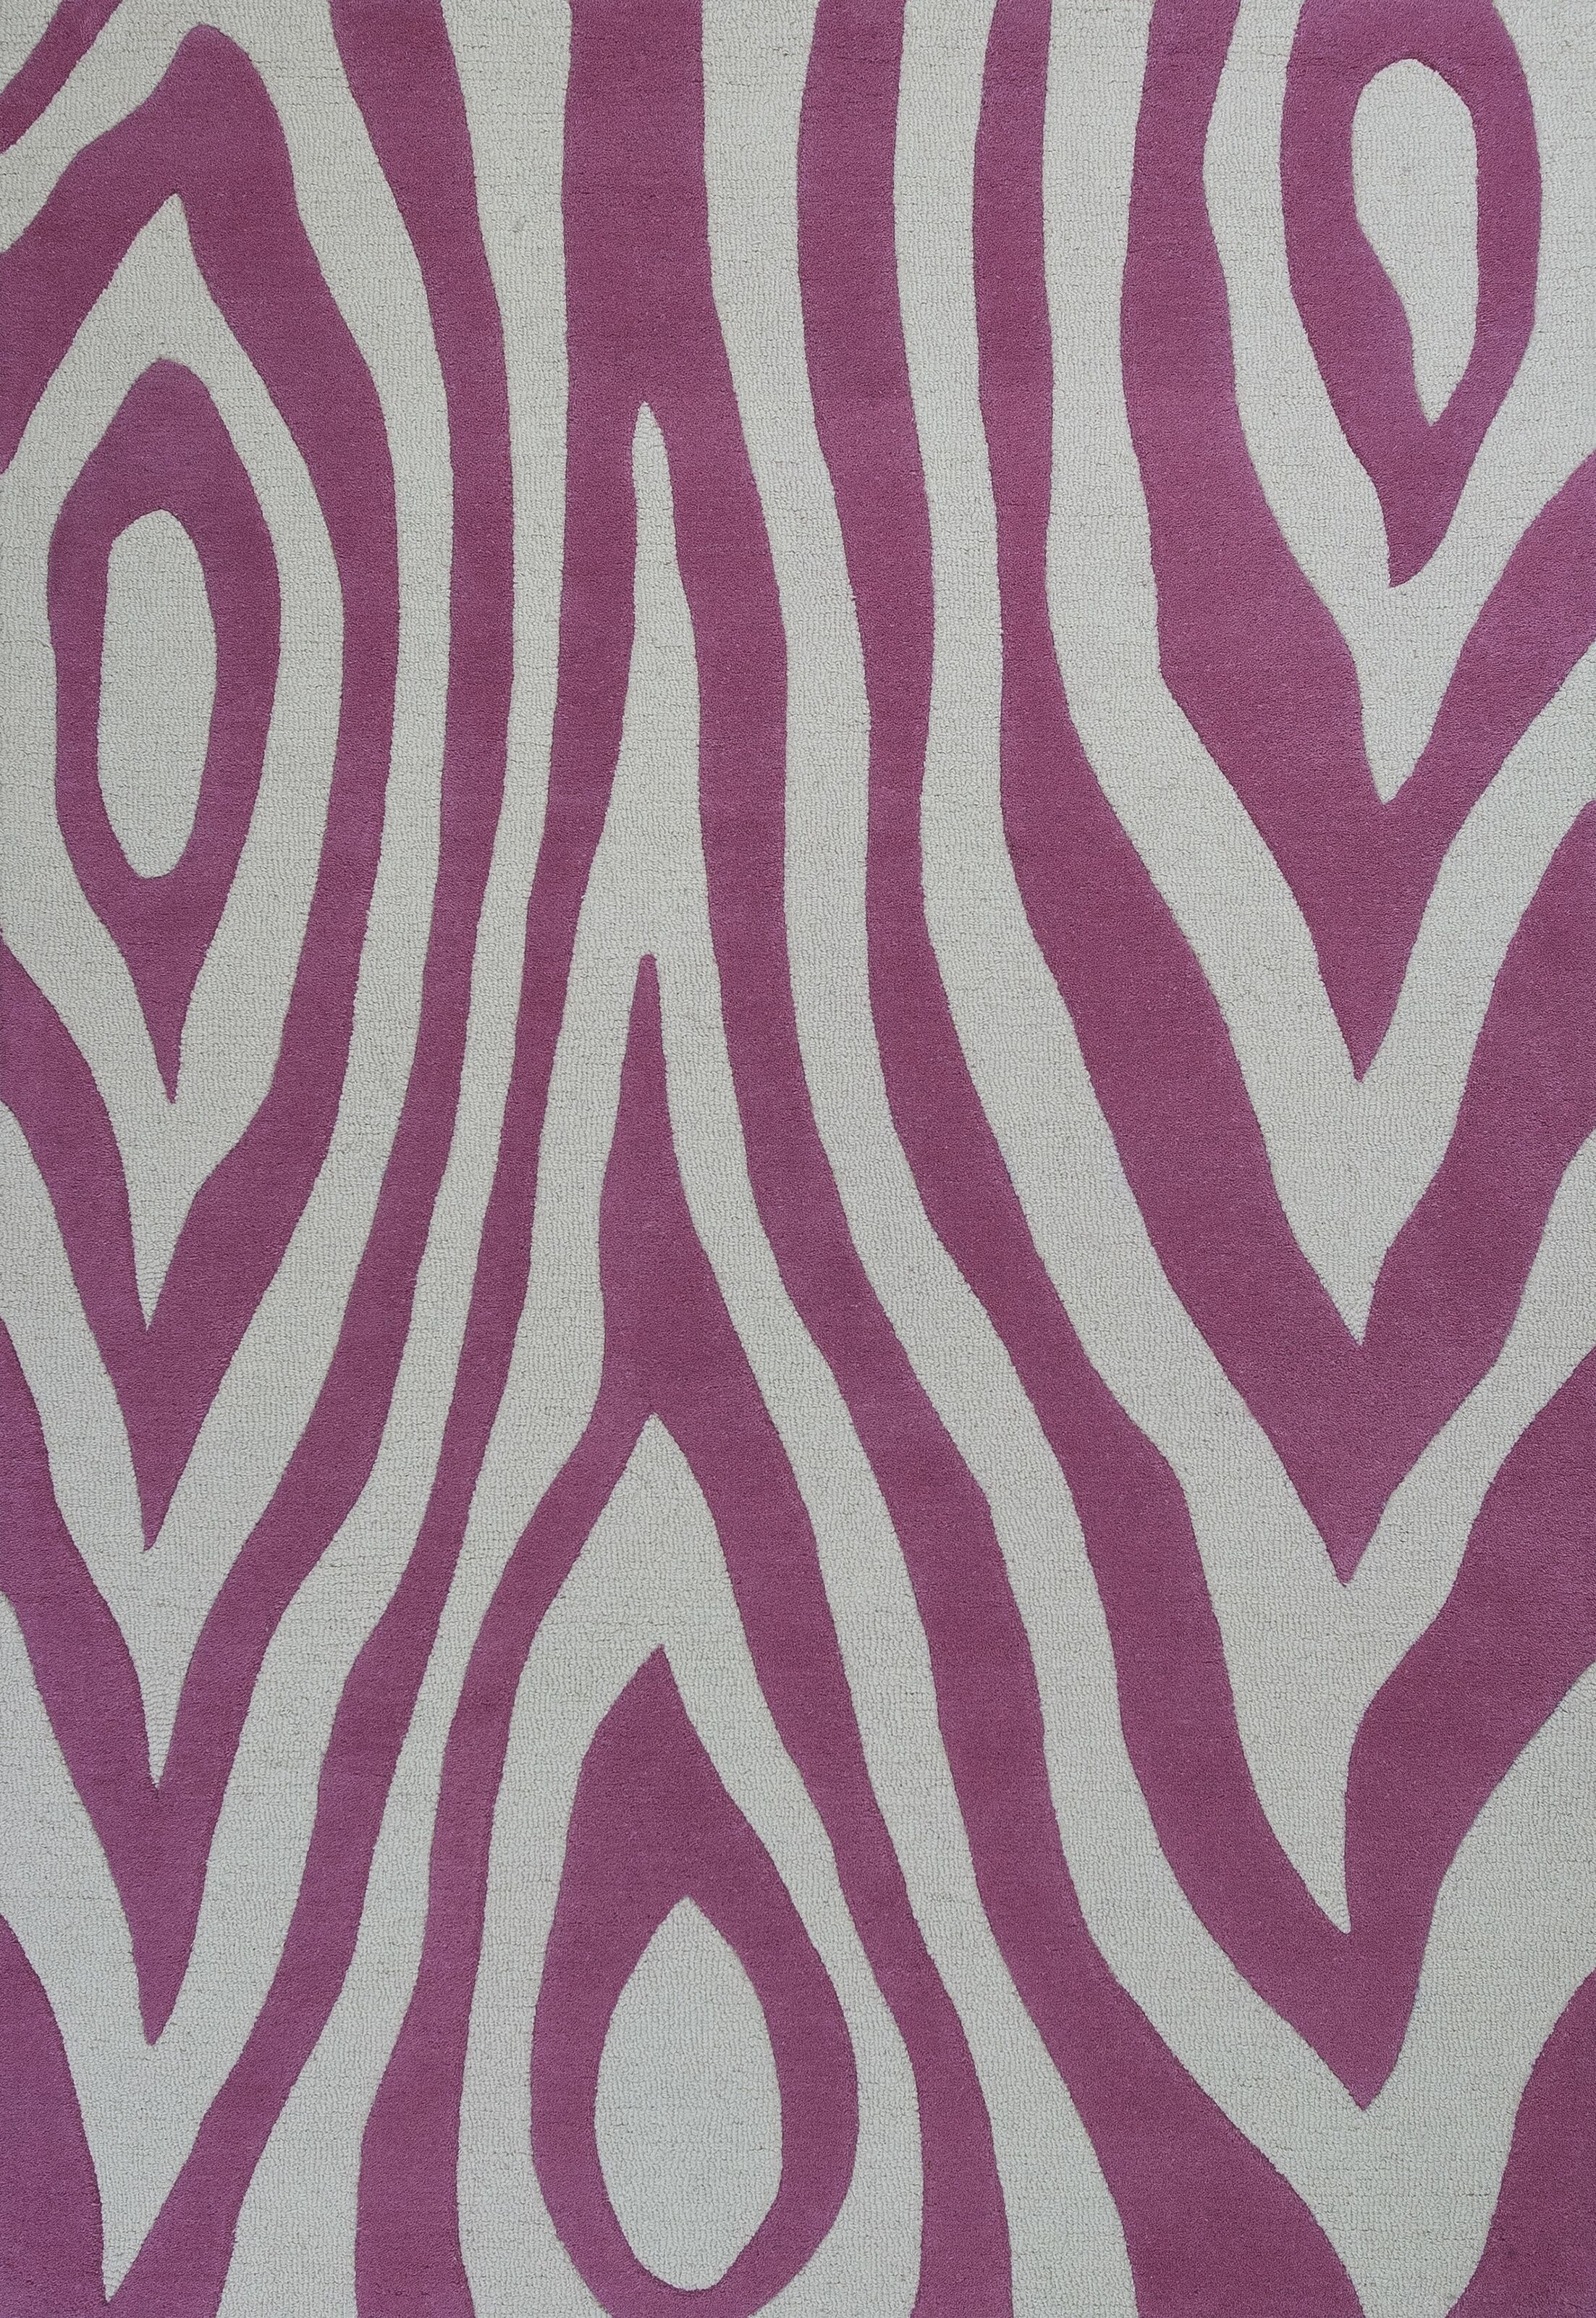 Shari Pink Wild Side Area Rug Rug Size: Rectangle 7'6